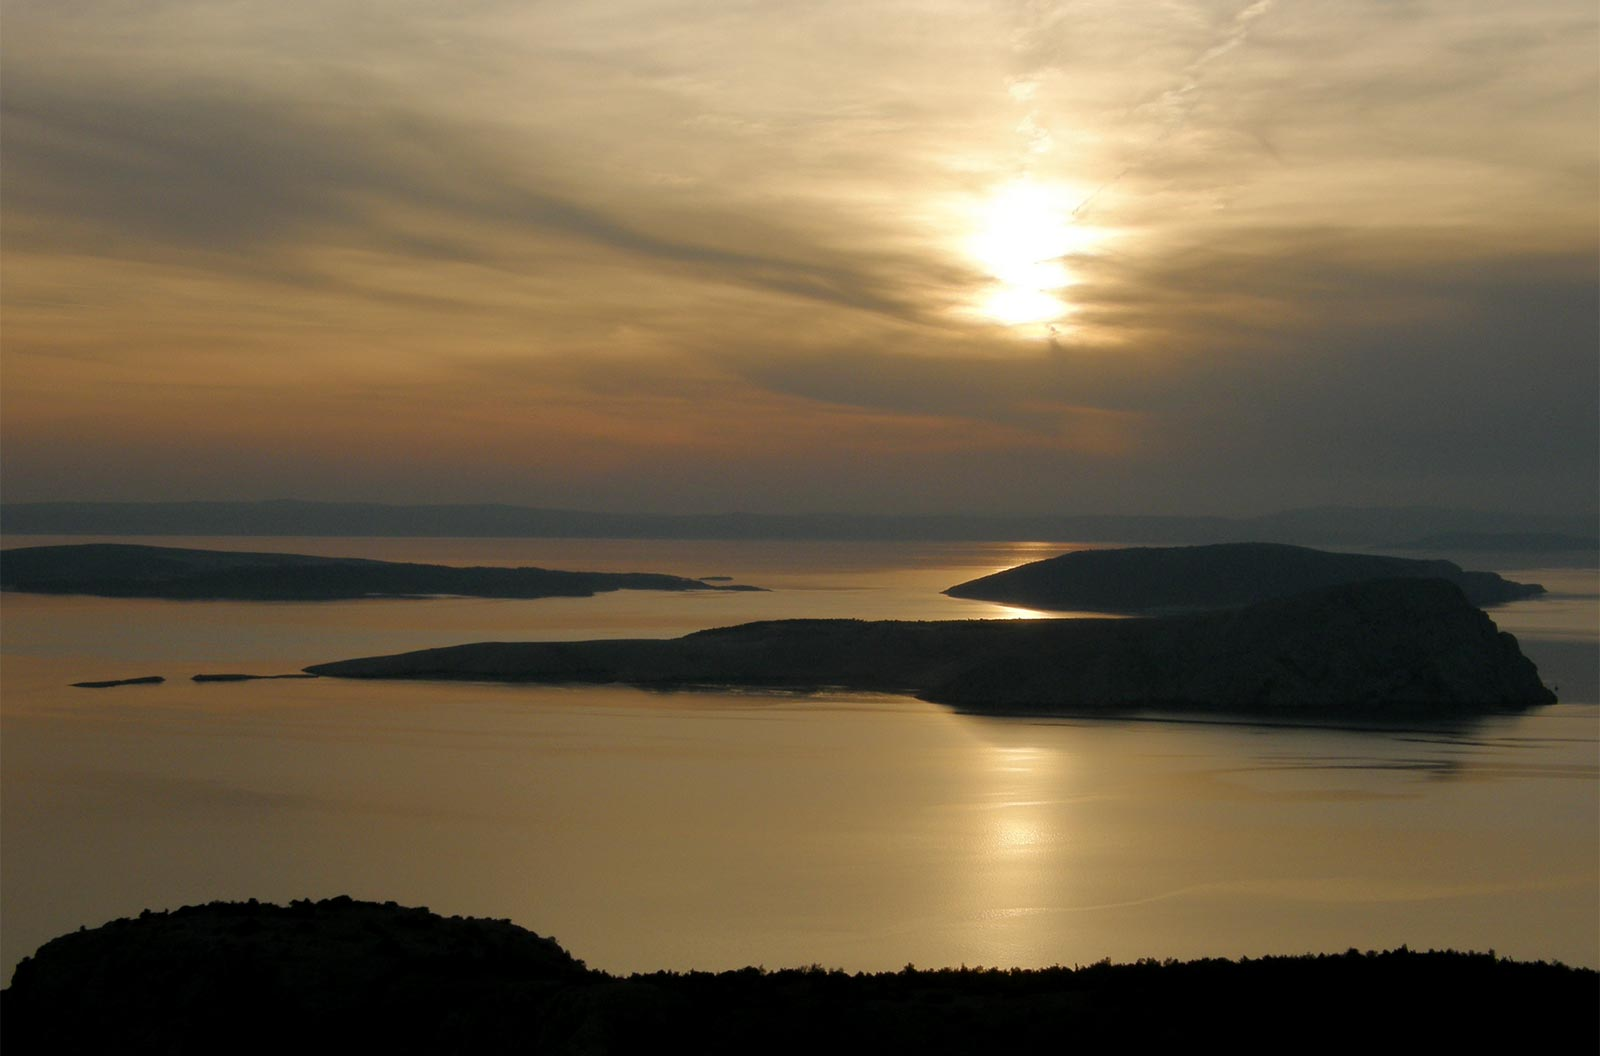 roadtrip-croatia-sunset-sea-view-yoniquenews